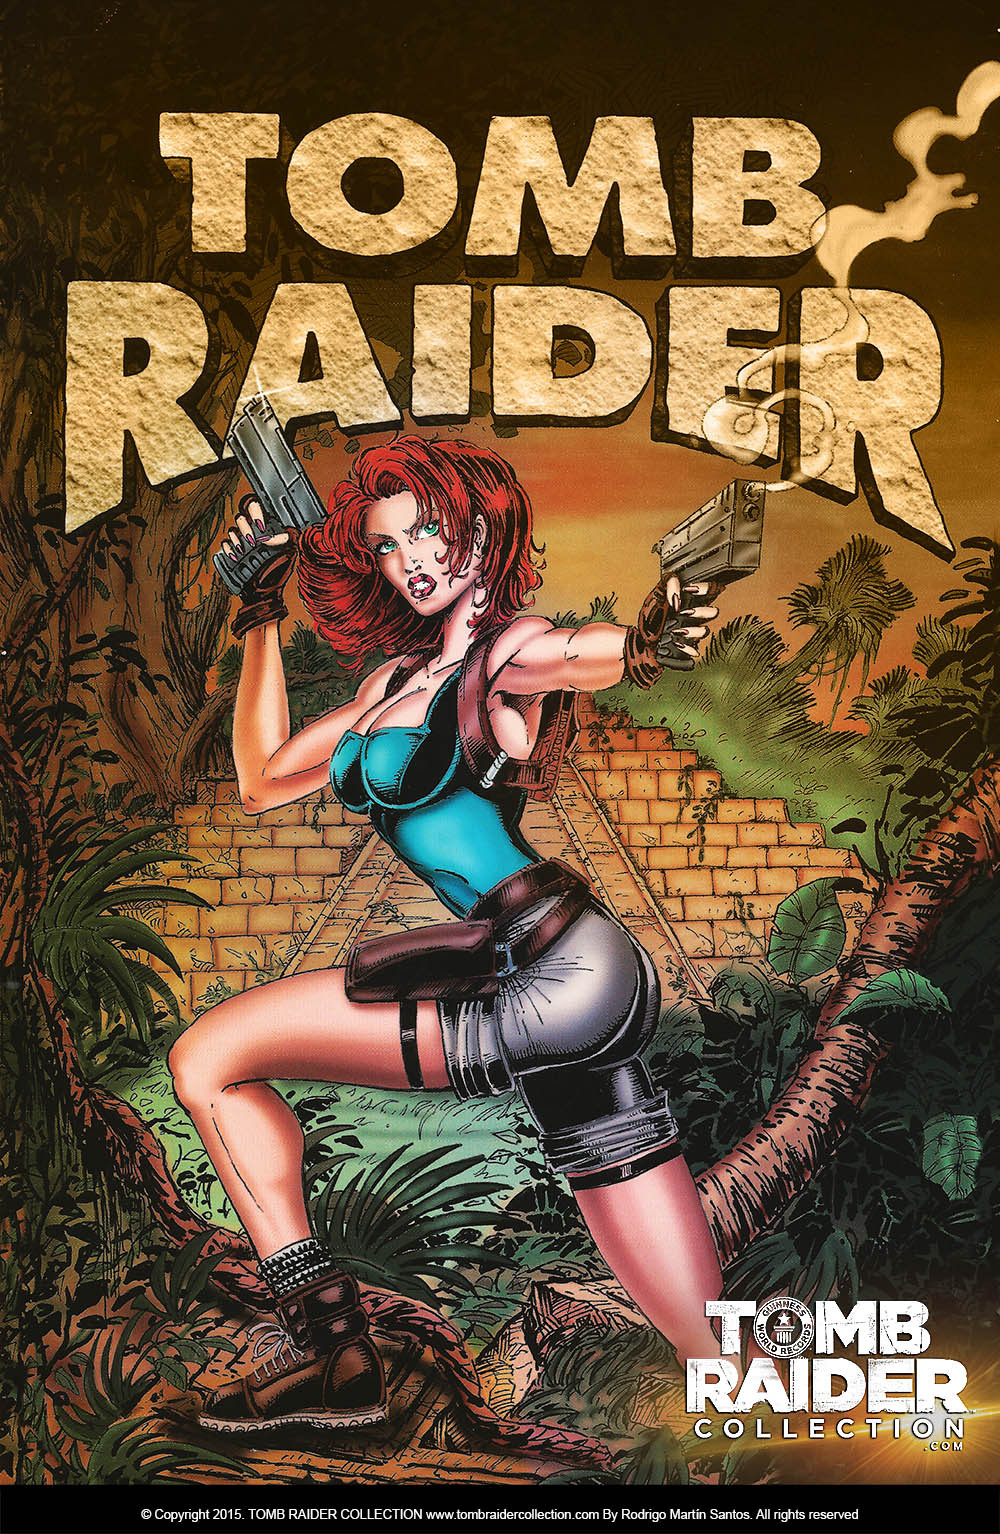 Tomb_Raider_concept_art_1995.jpg